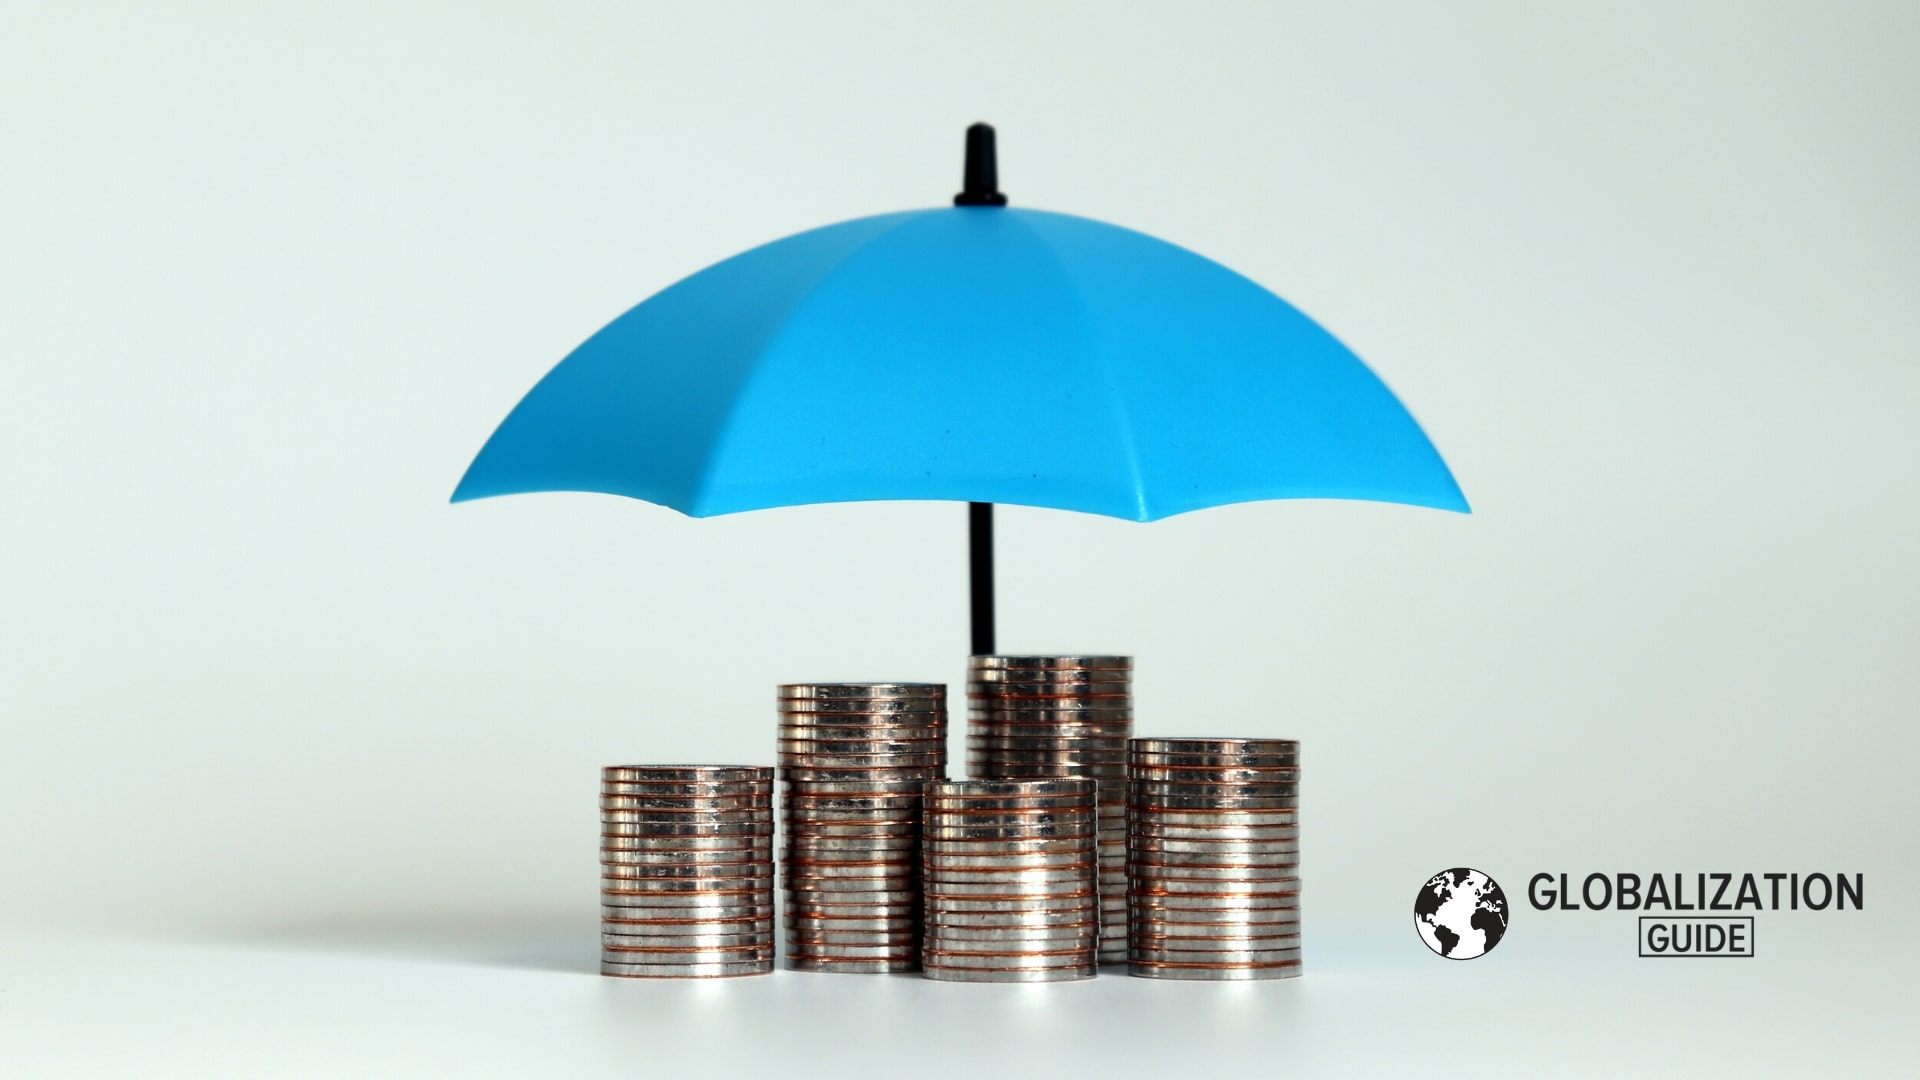 Ahorros pension paragua azul monedas